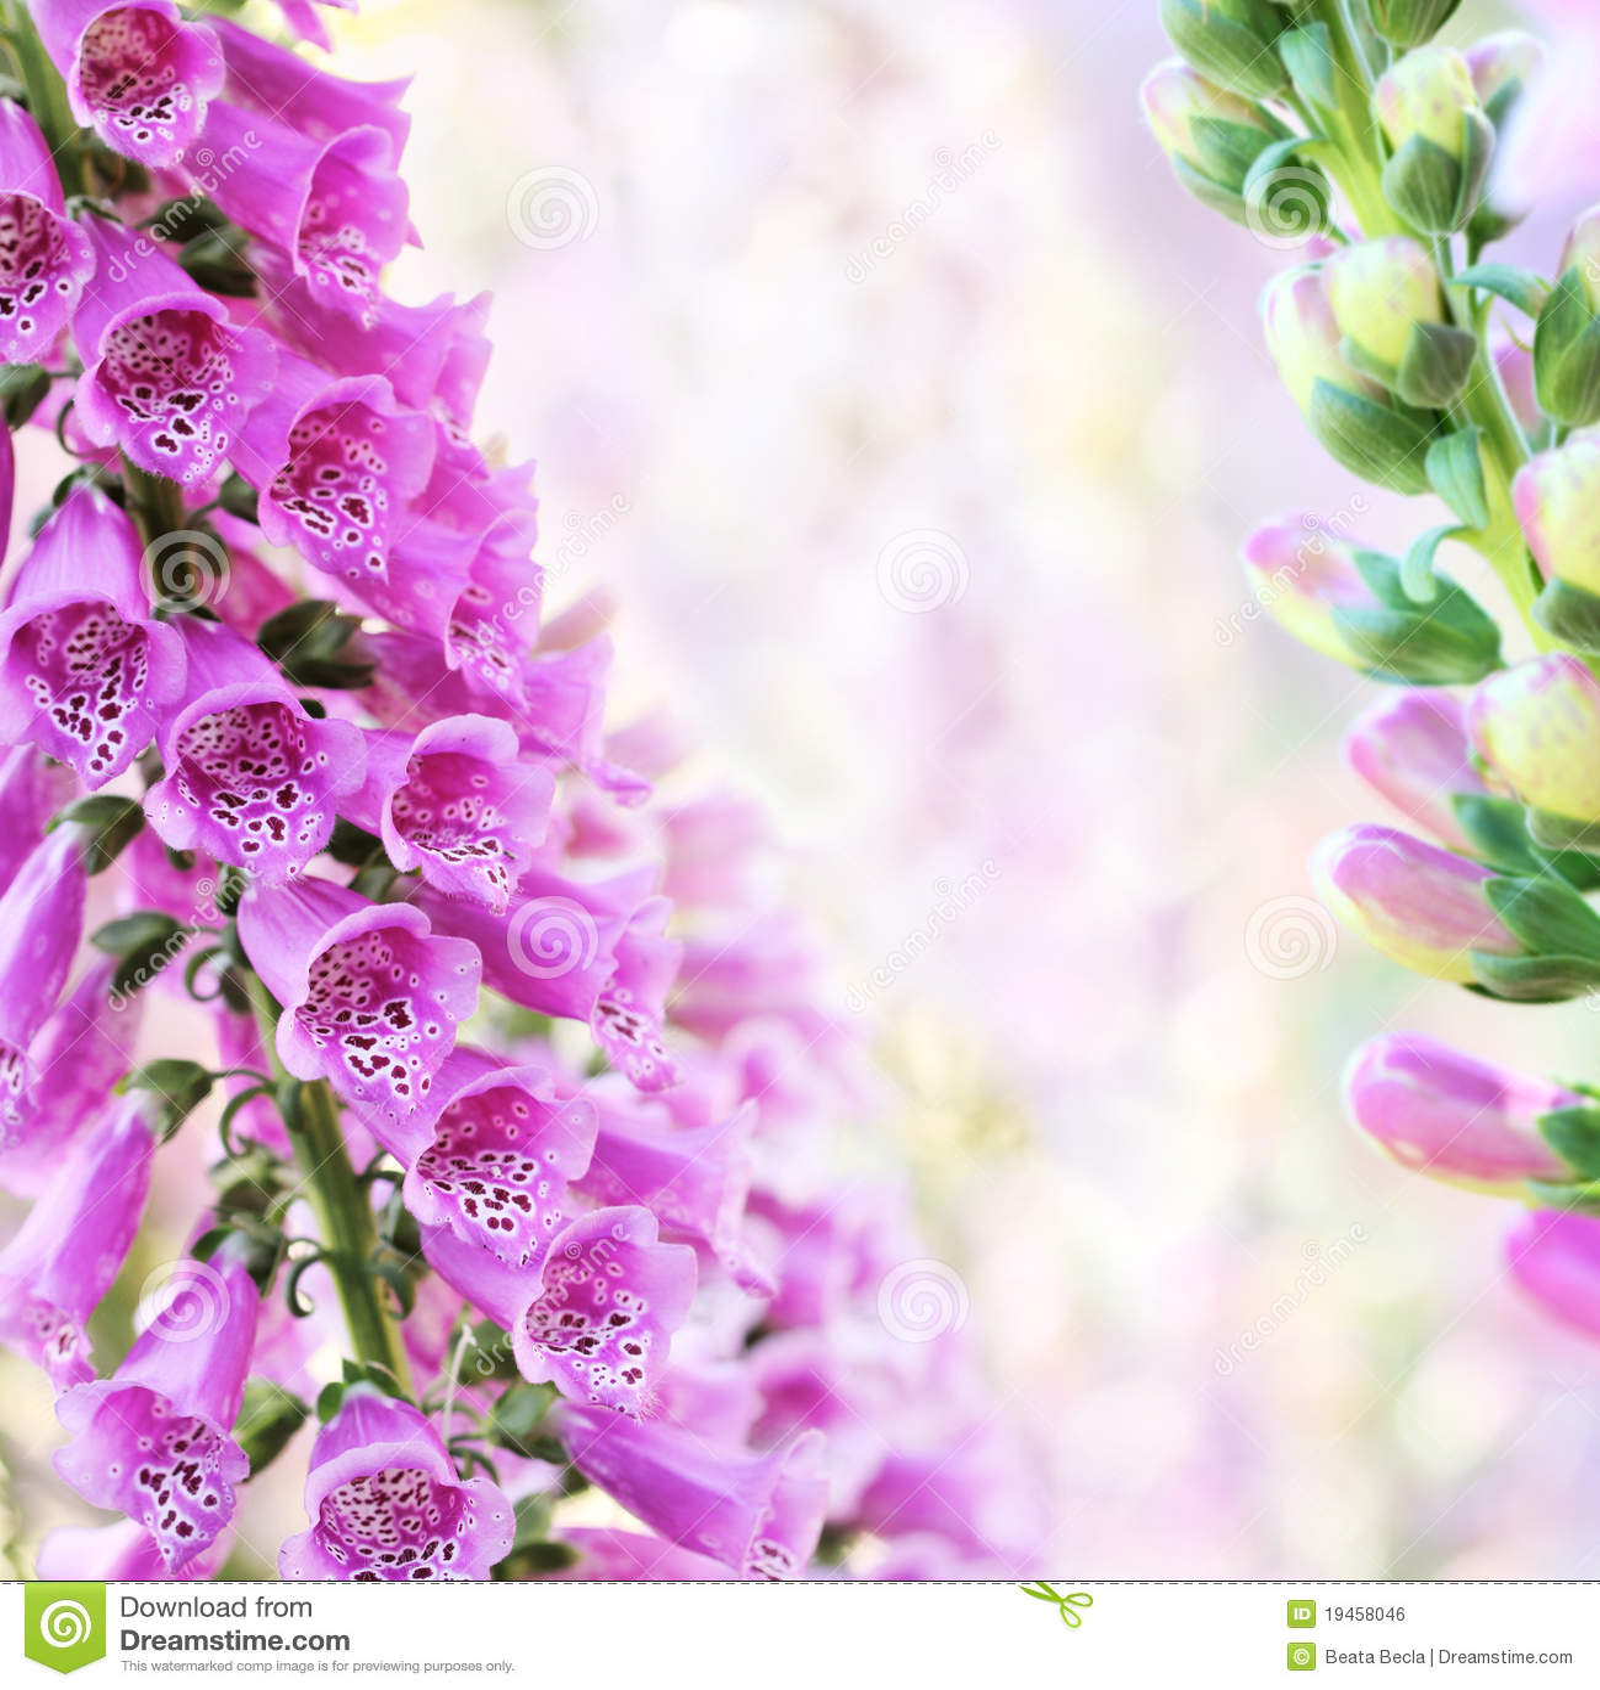 Spring Summer Digitalis Or Foxglove Flowers Stock Photo Image Of